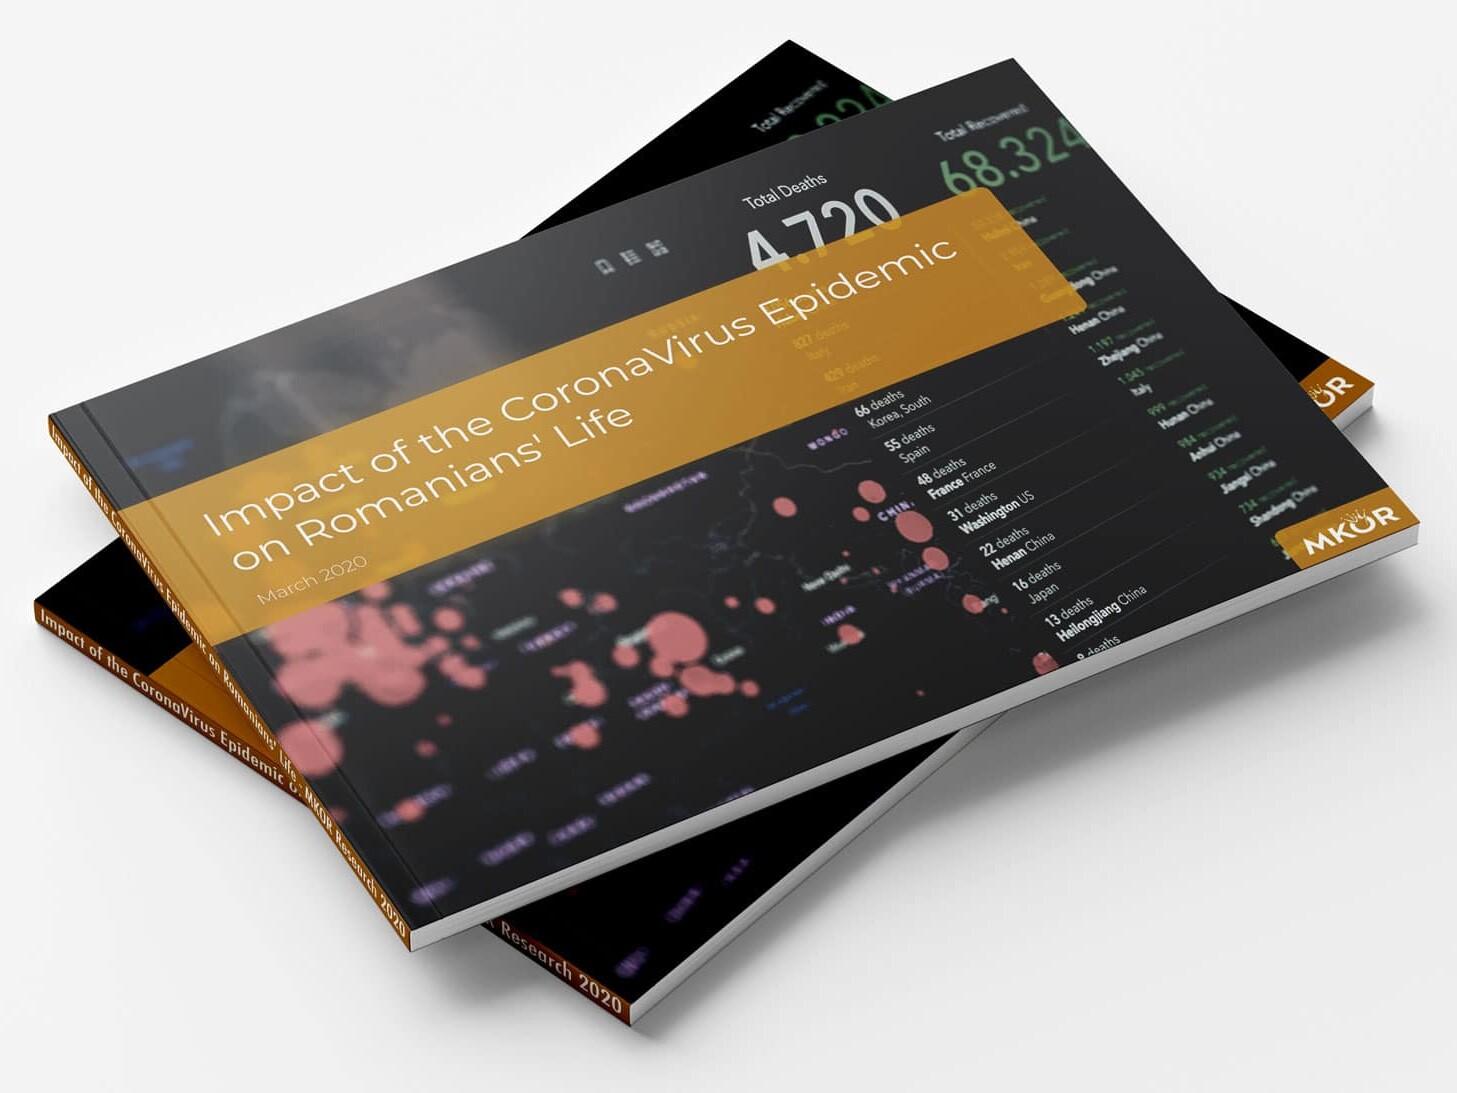 corona-virus-impact-romania-report